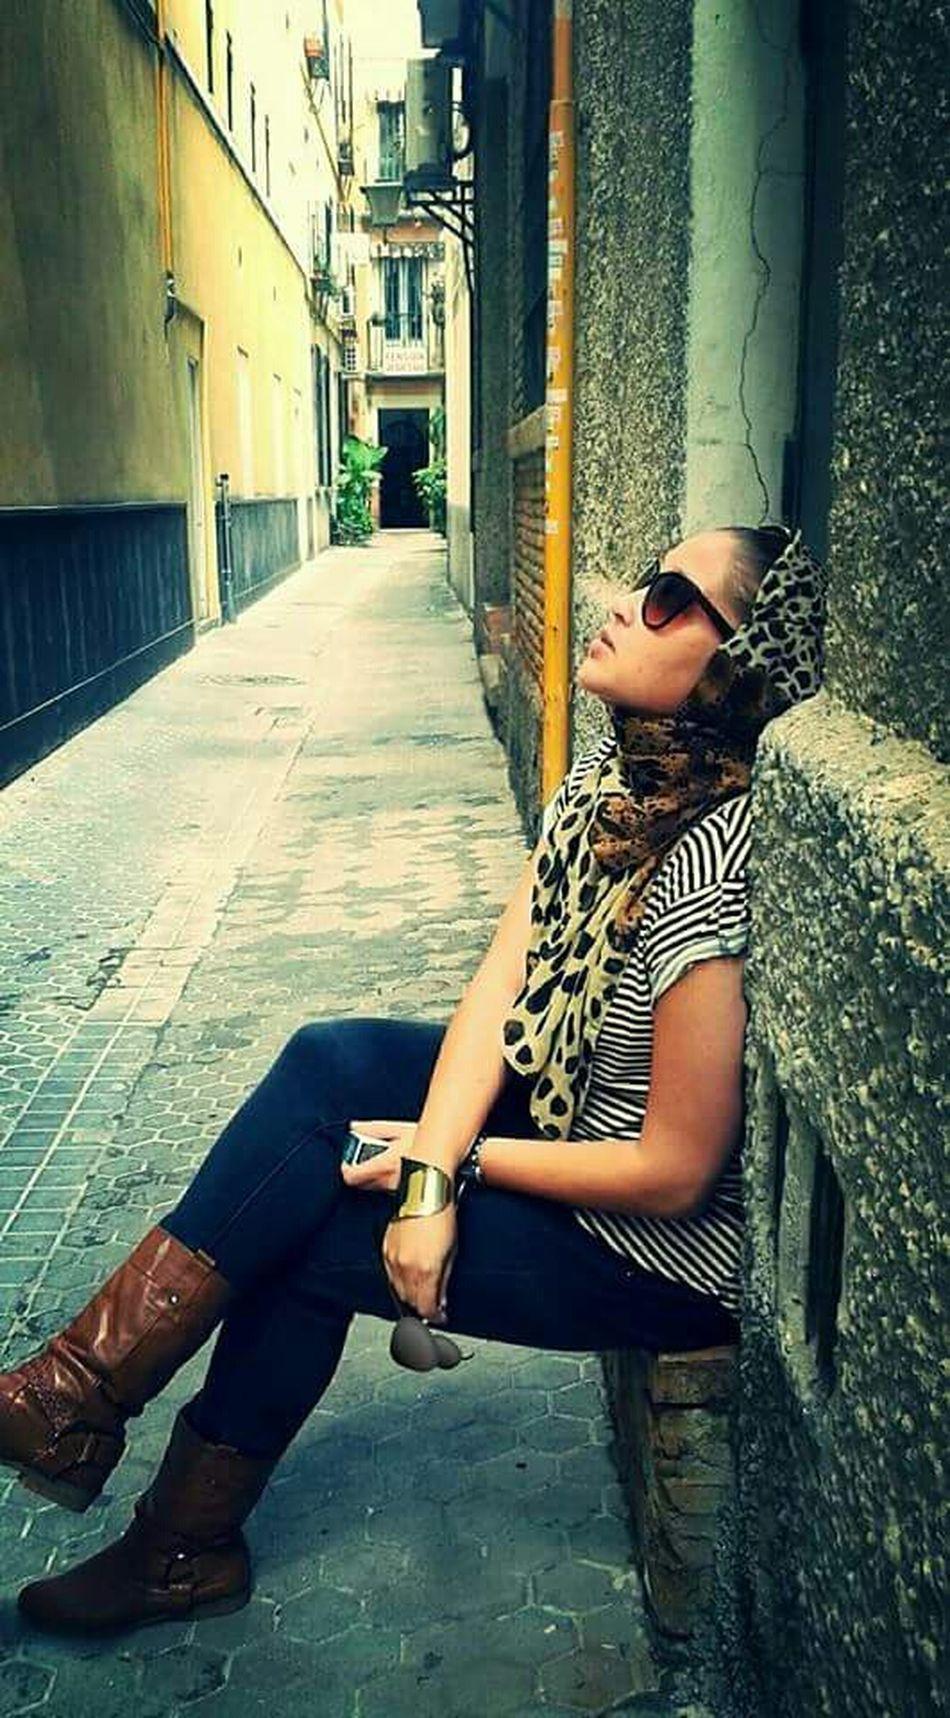 The Traveler - 2015 EyeEm Awards TheFashionist-2015EyeEmAwards The Portraitist - 2015 EyeEm Awards Photocredits2zaidaL Fashion Fashion&love&beauty Fashionista Moments SPAIN Beautifulgirls